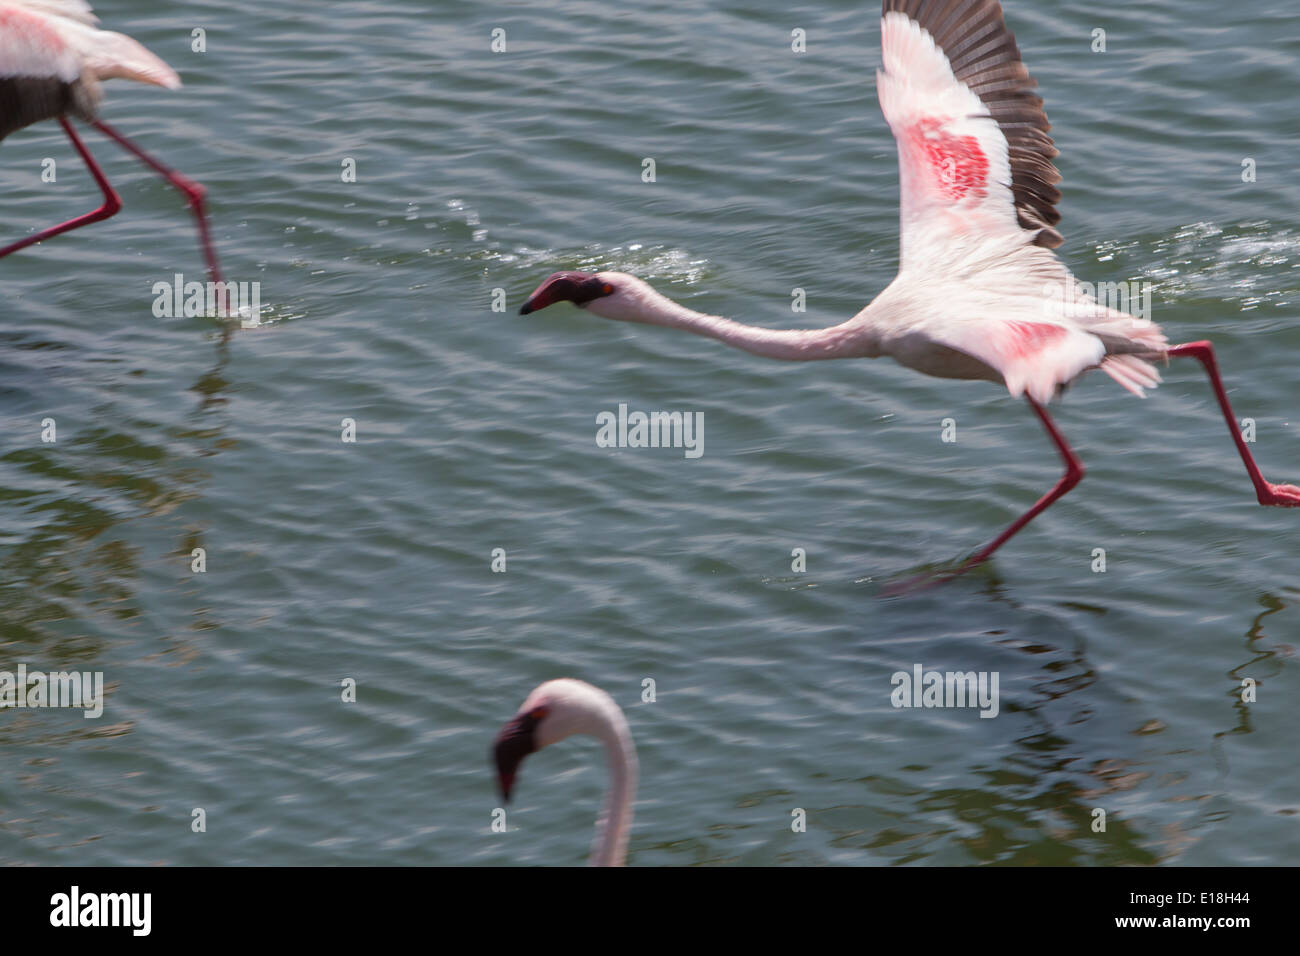 Flamingos in flight at Arusha National Park, Tanzania, East Africa. - Stock Image